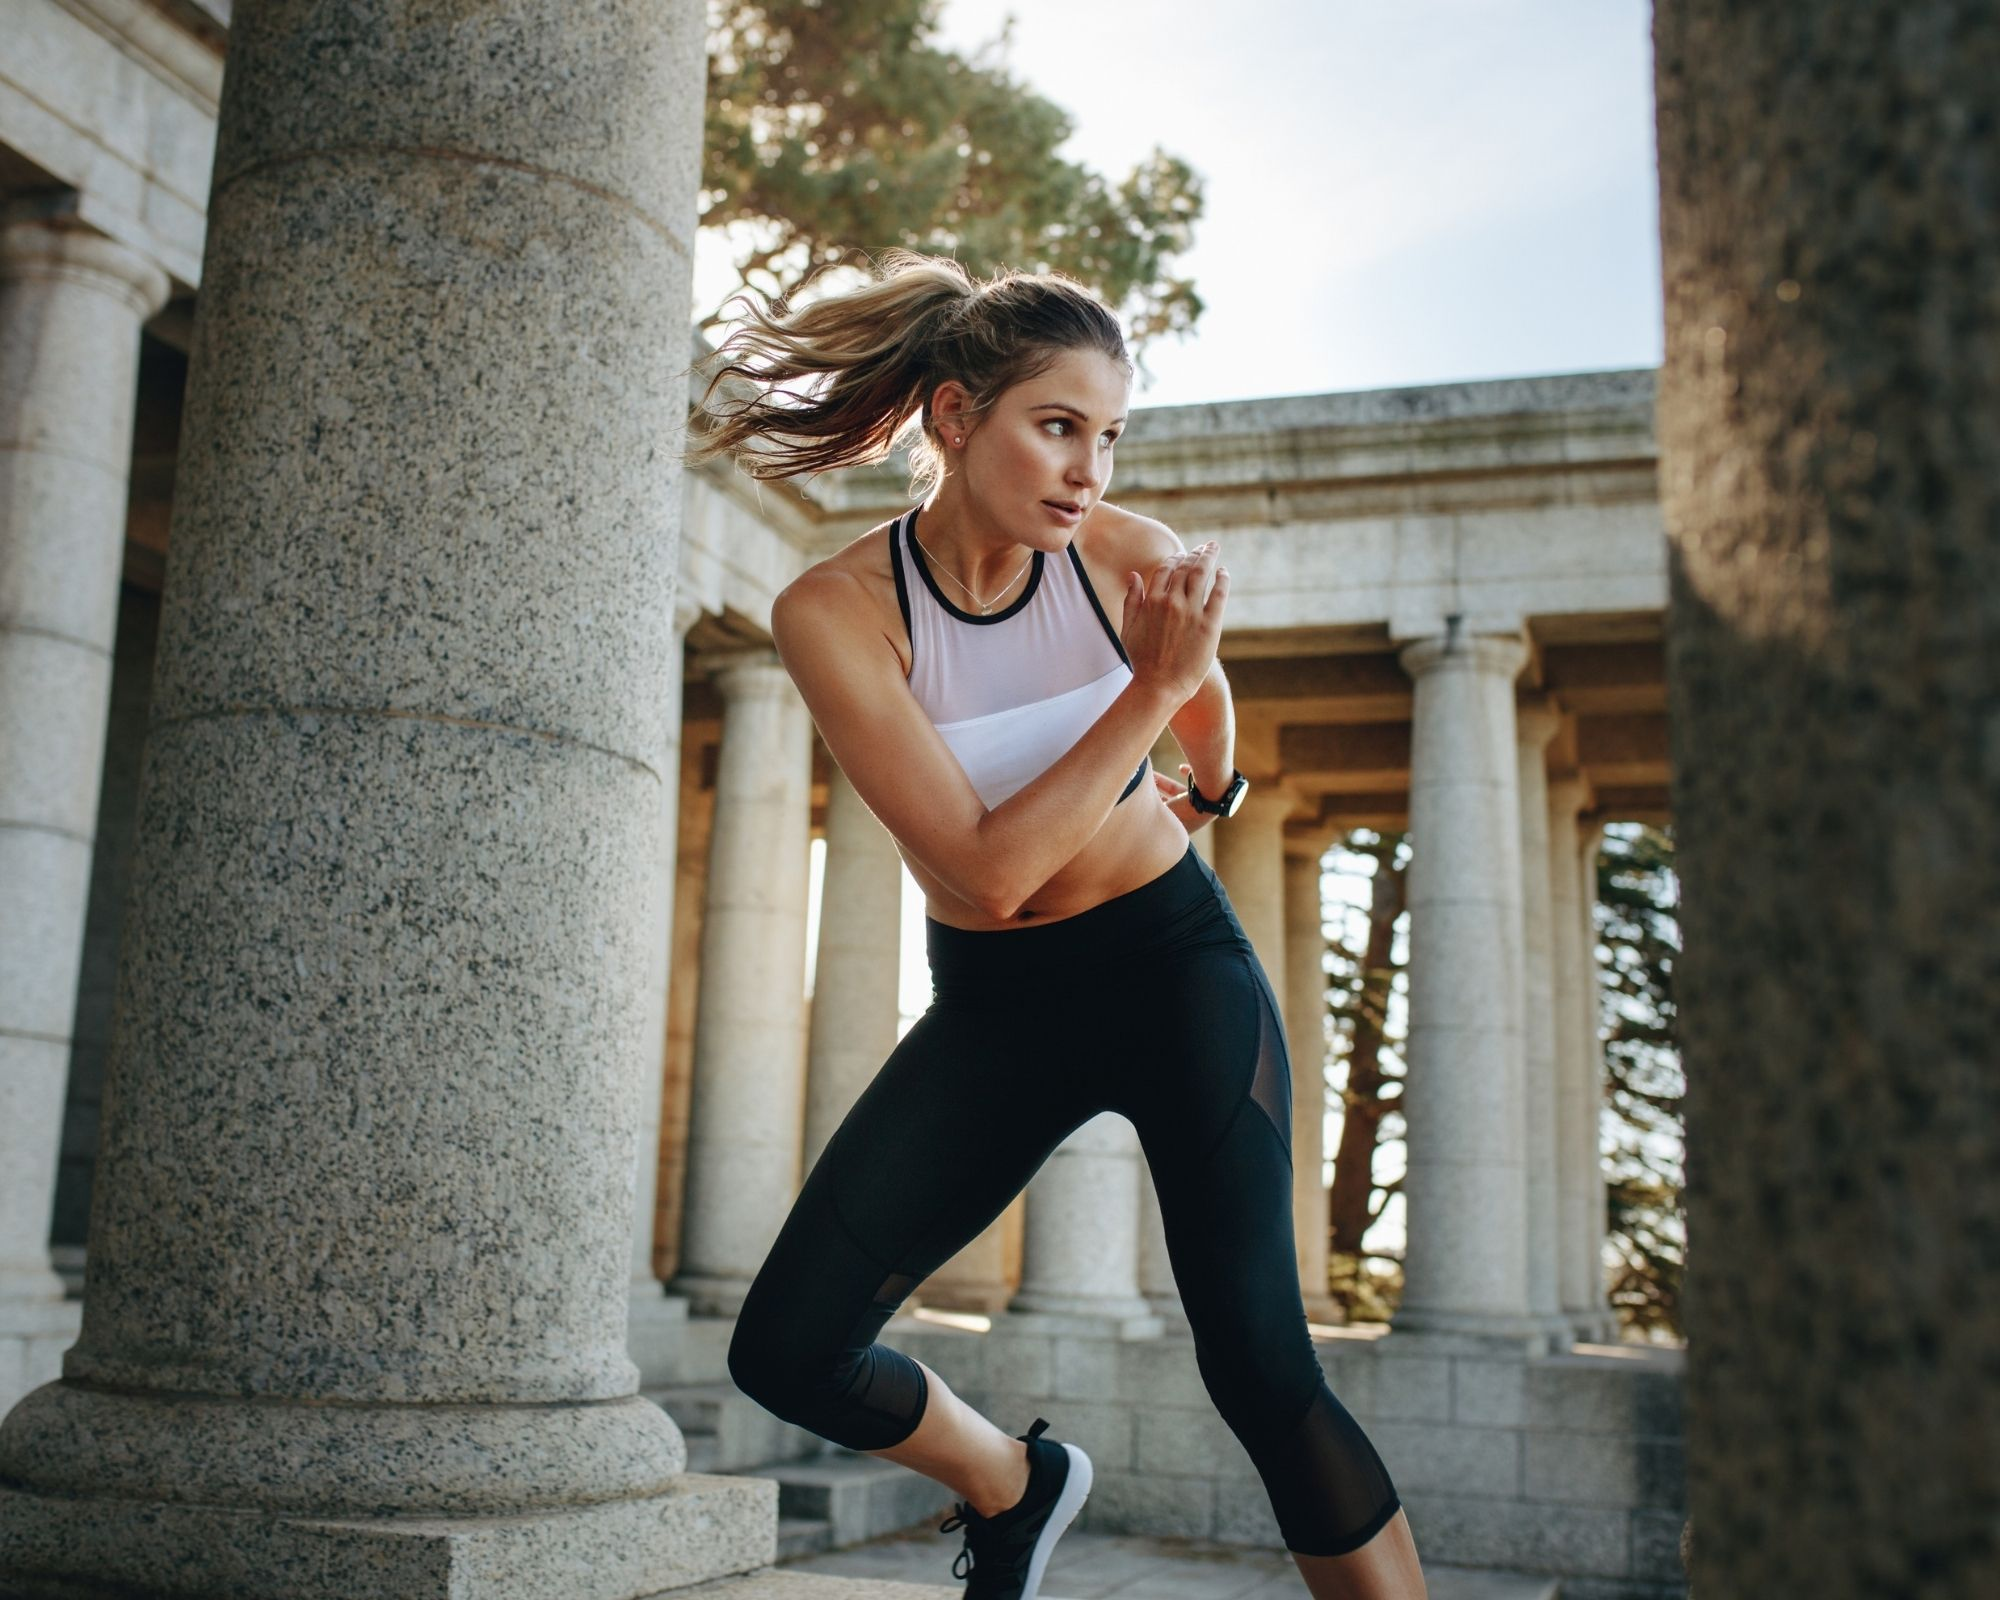 apparire bene in abiti da fitness